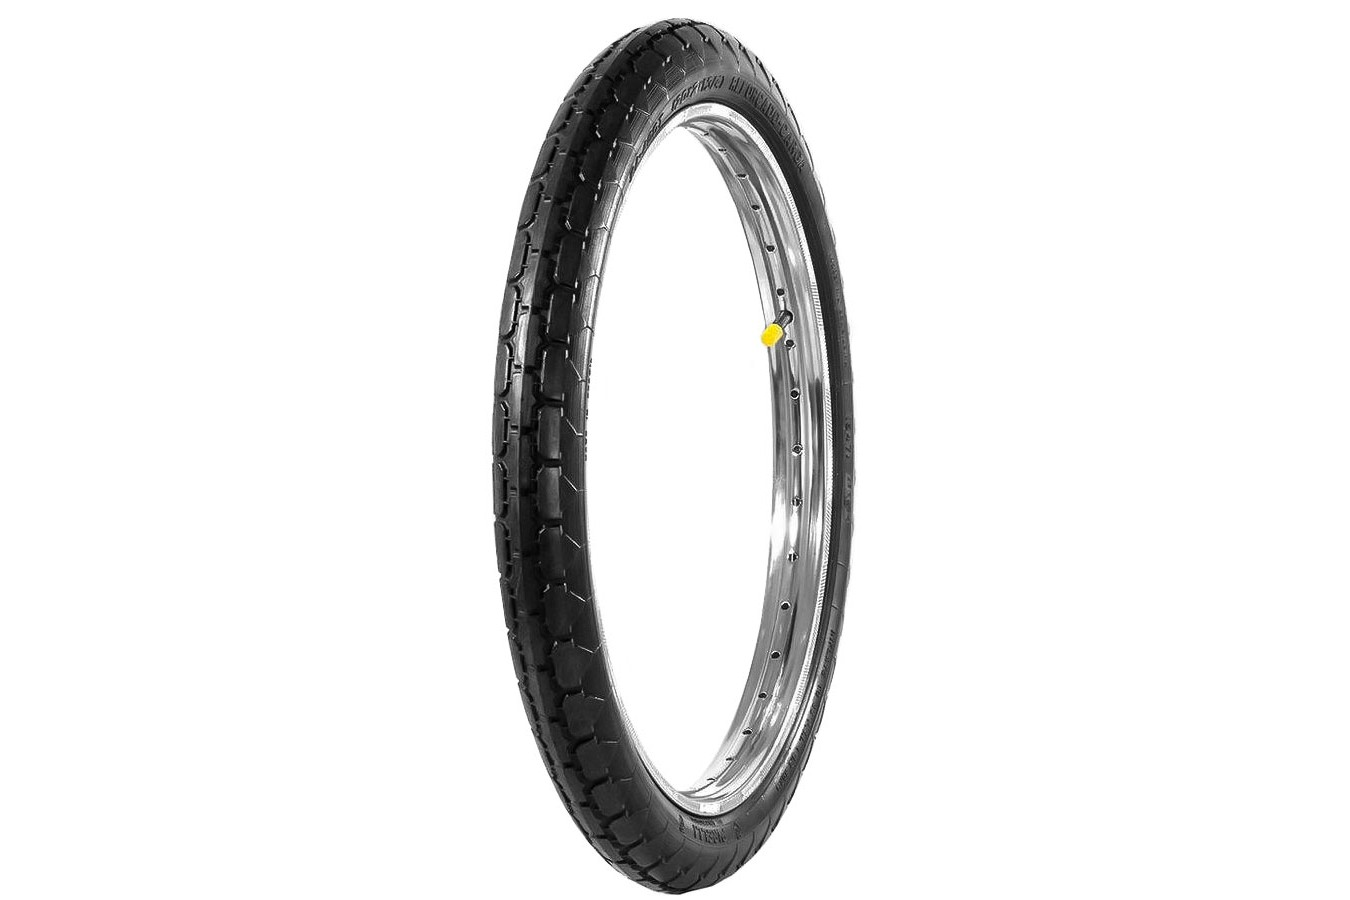 Pneu 20x2x1.3/4 (54-400) Reforçado Carga - Pirelli